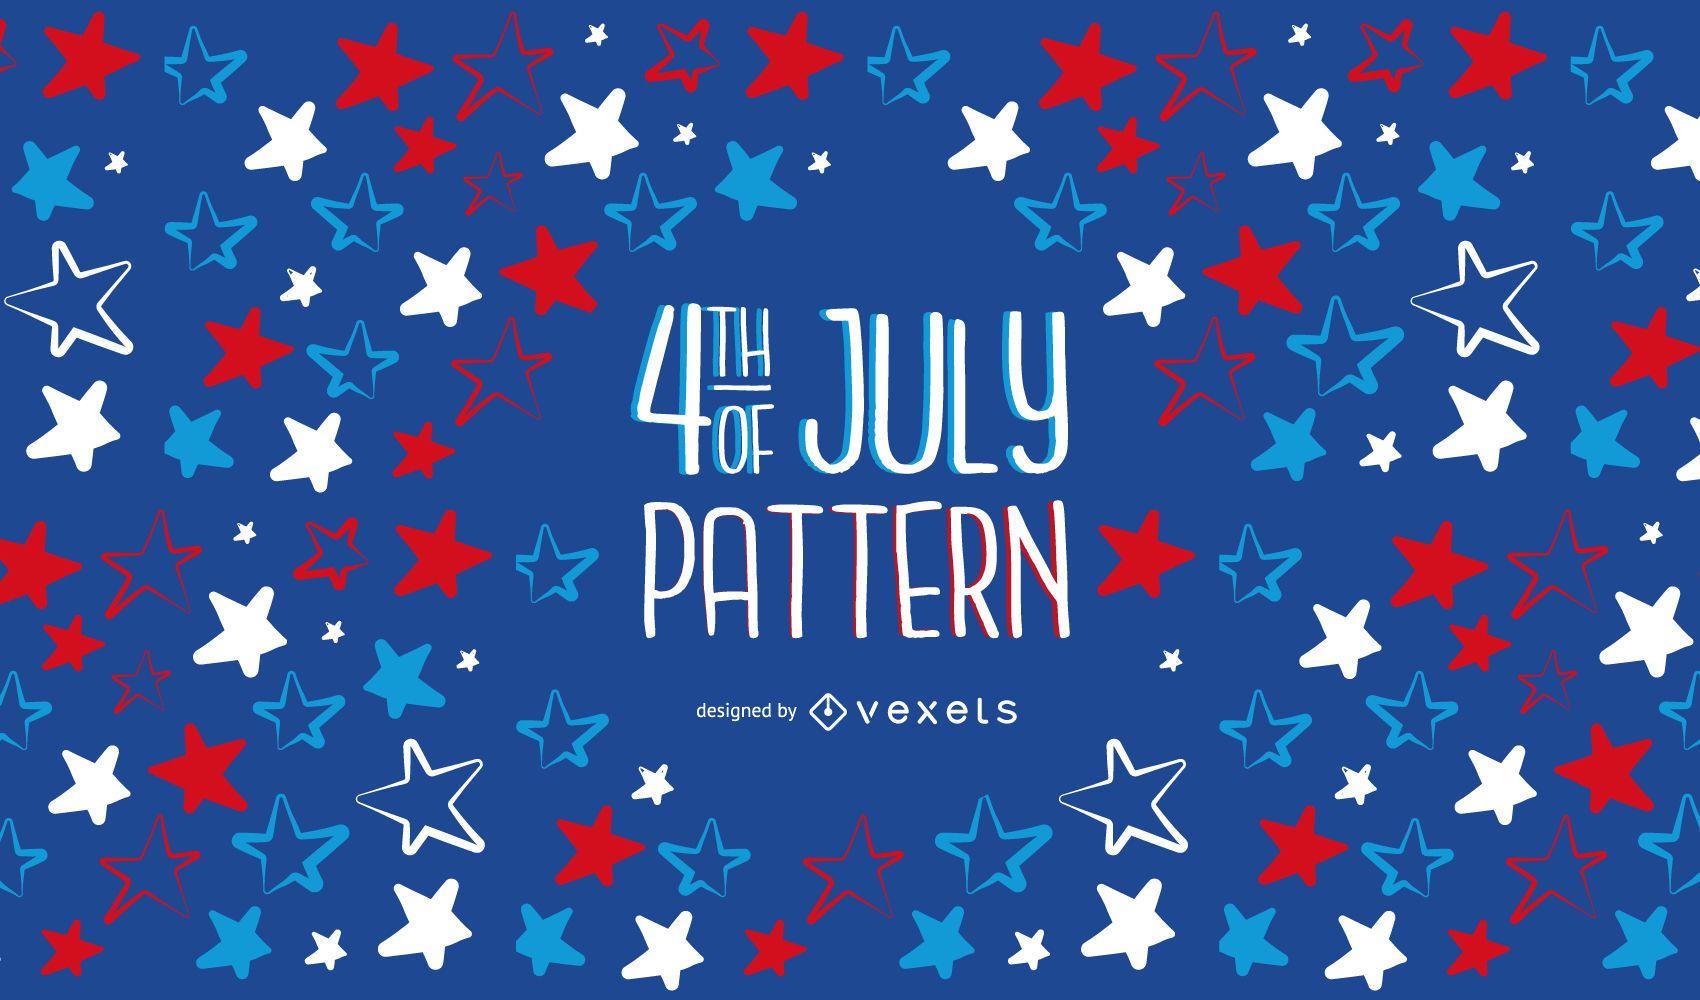 4 de Jully Pattern Design